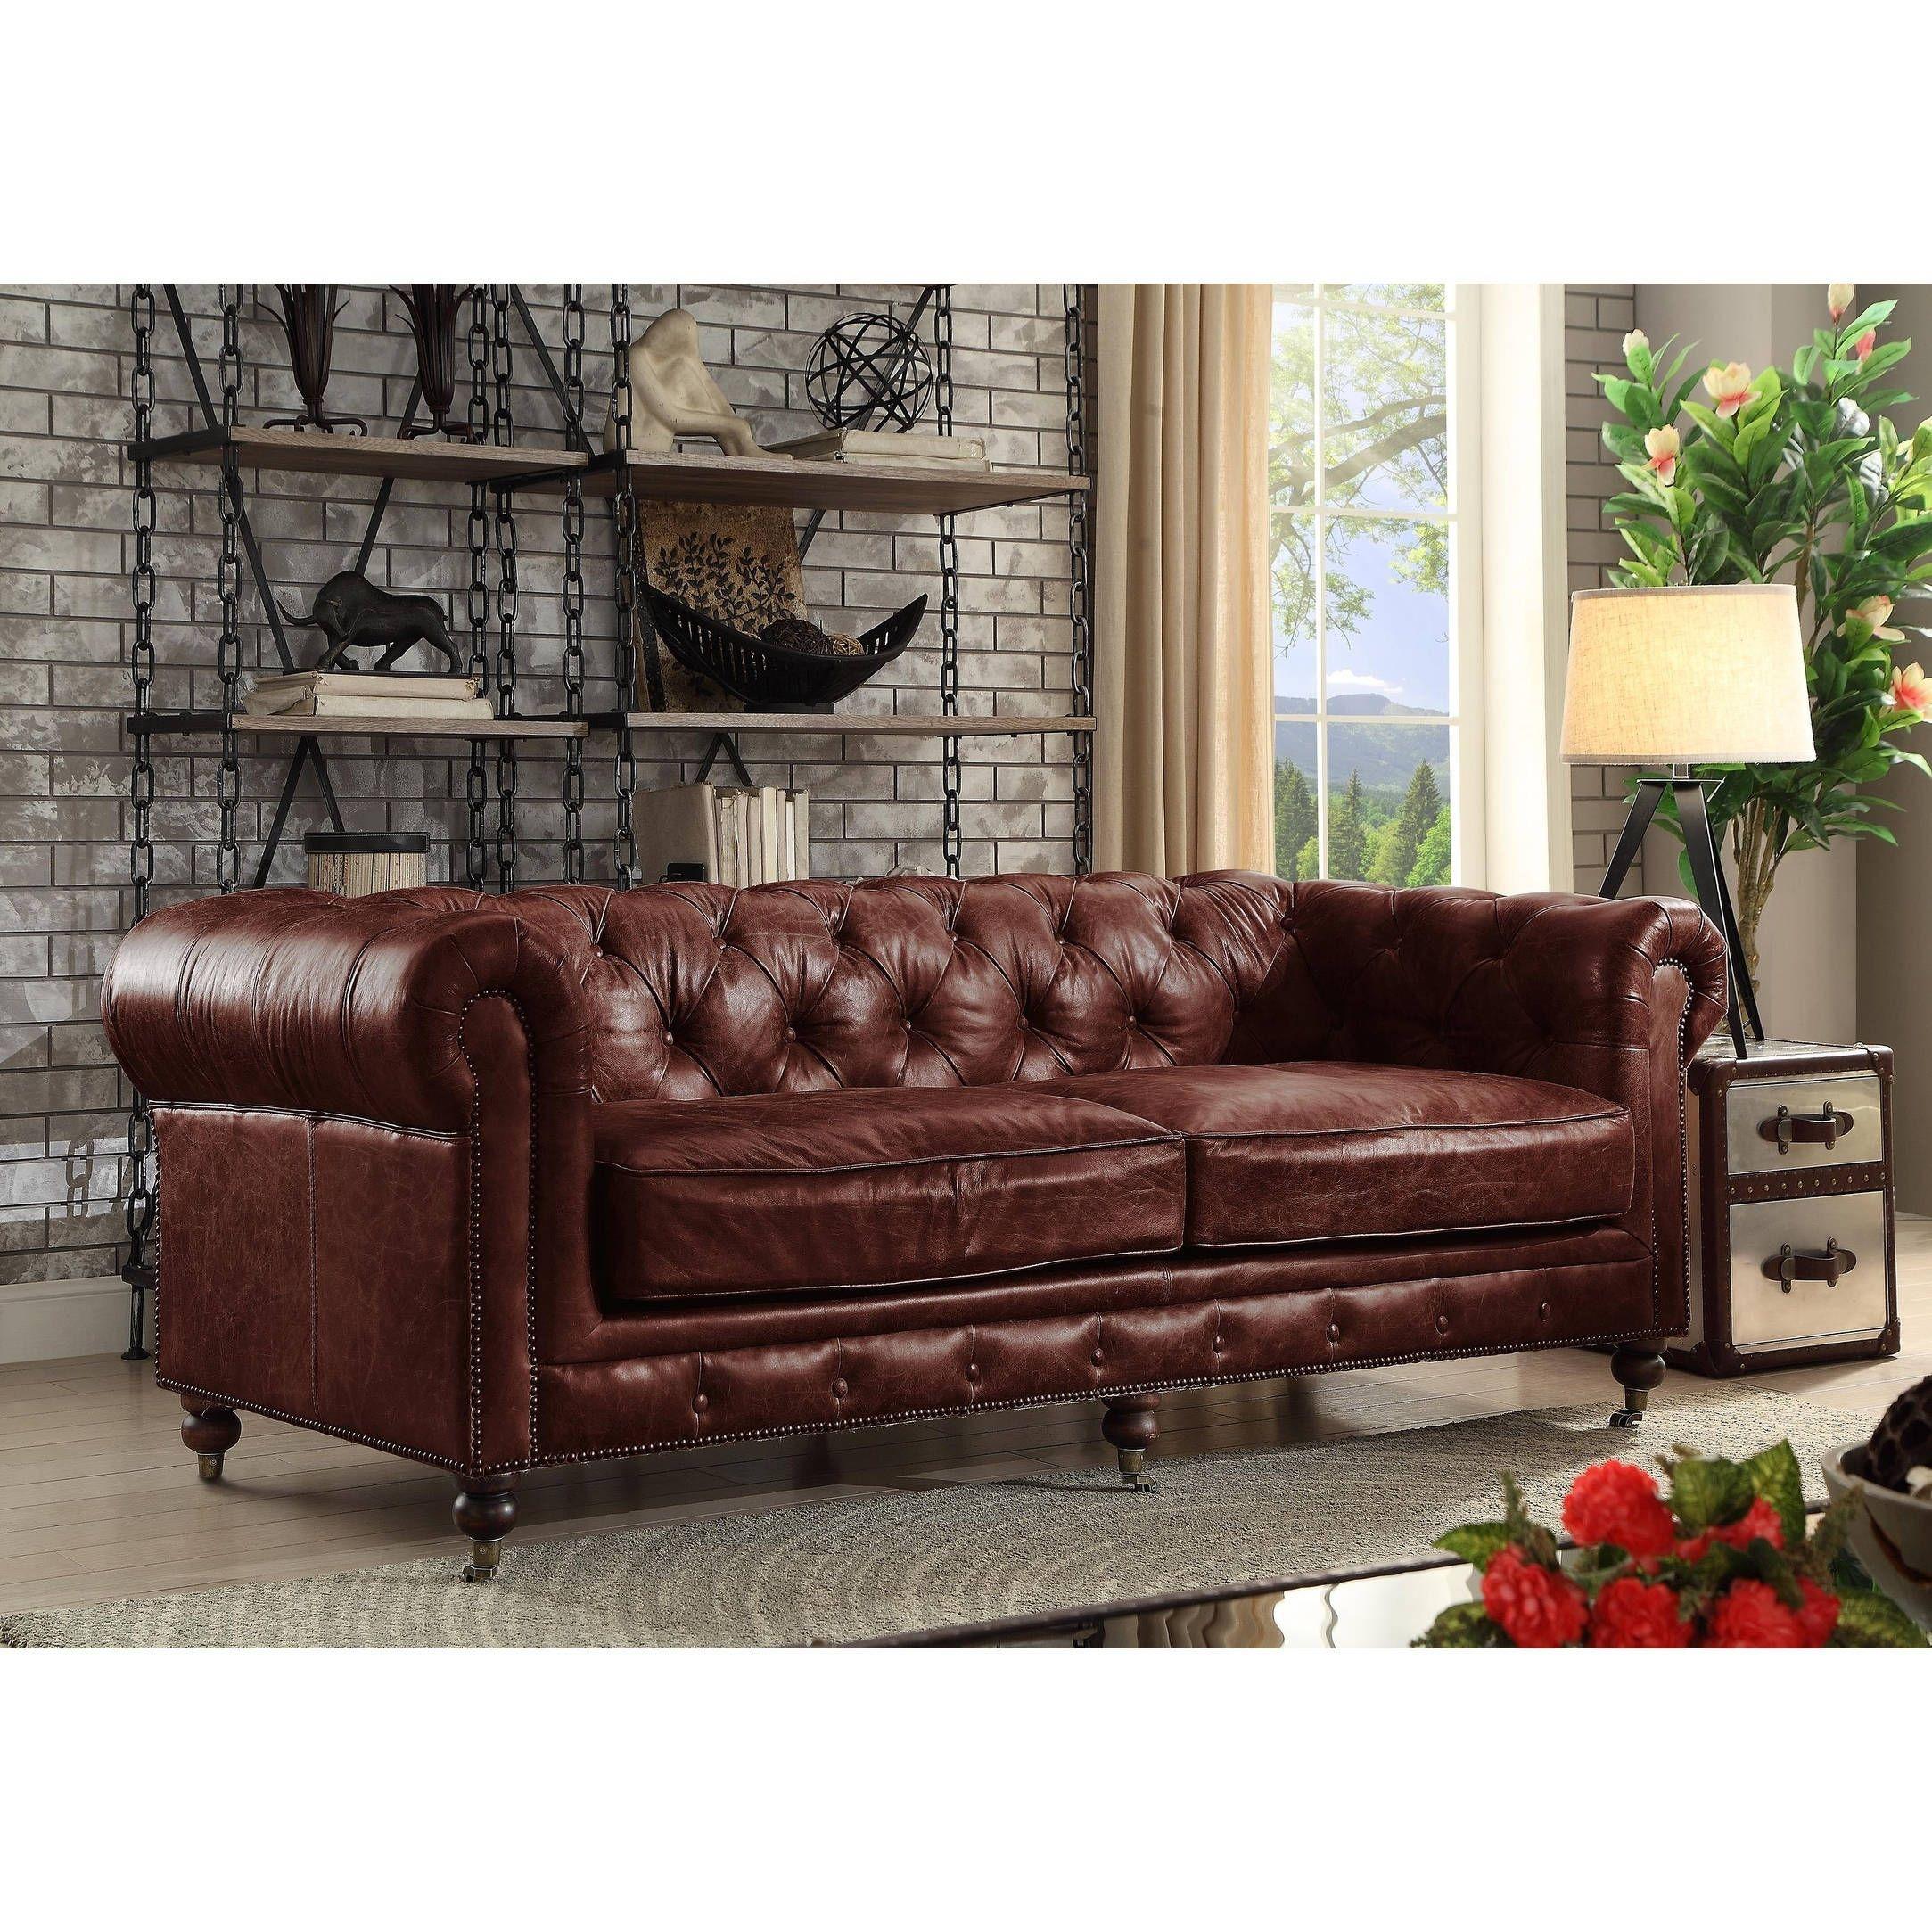 4d0f11cfa455 Acme Furniture Aberdeen Vintage Dark Brown Top Grain Leather Loveseat